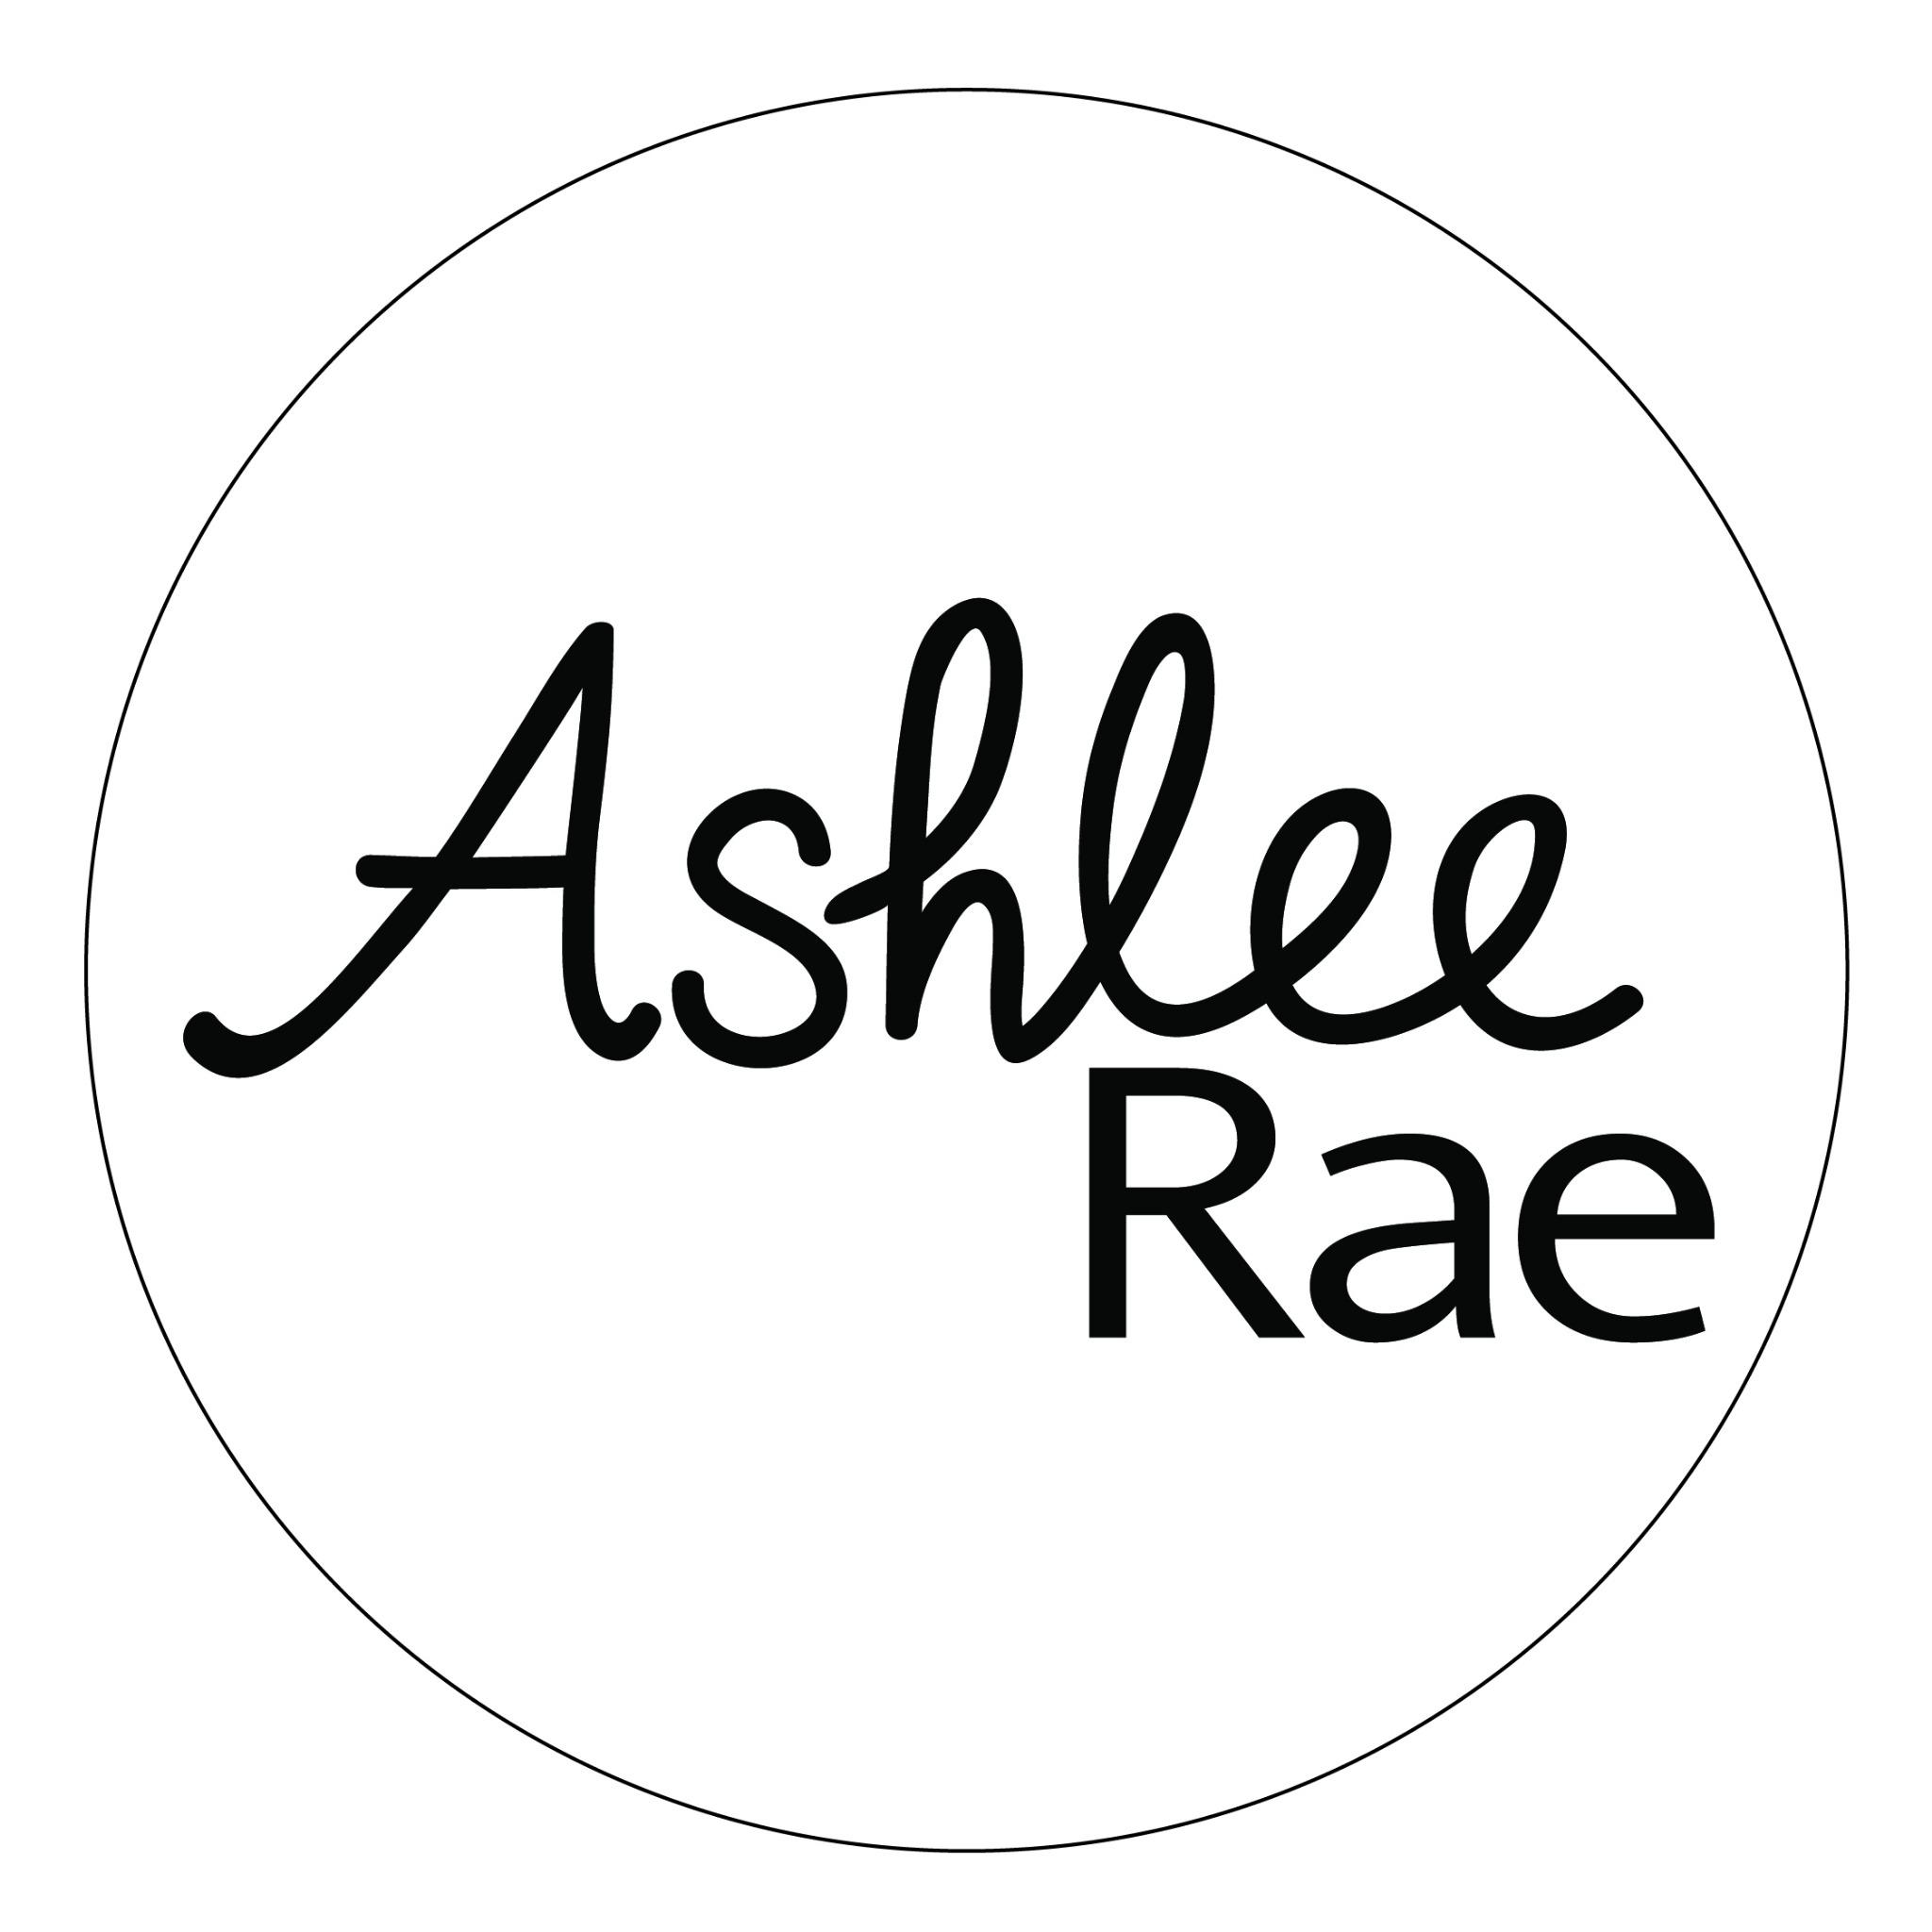 Ashlee Rae